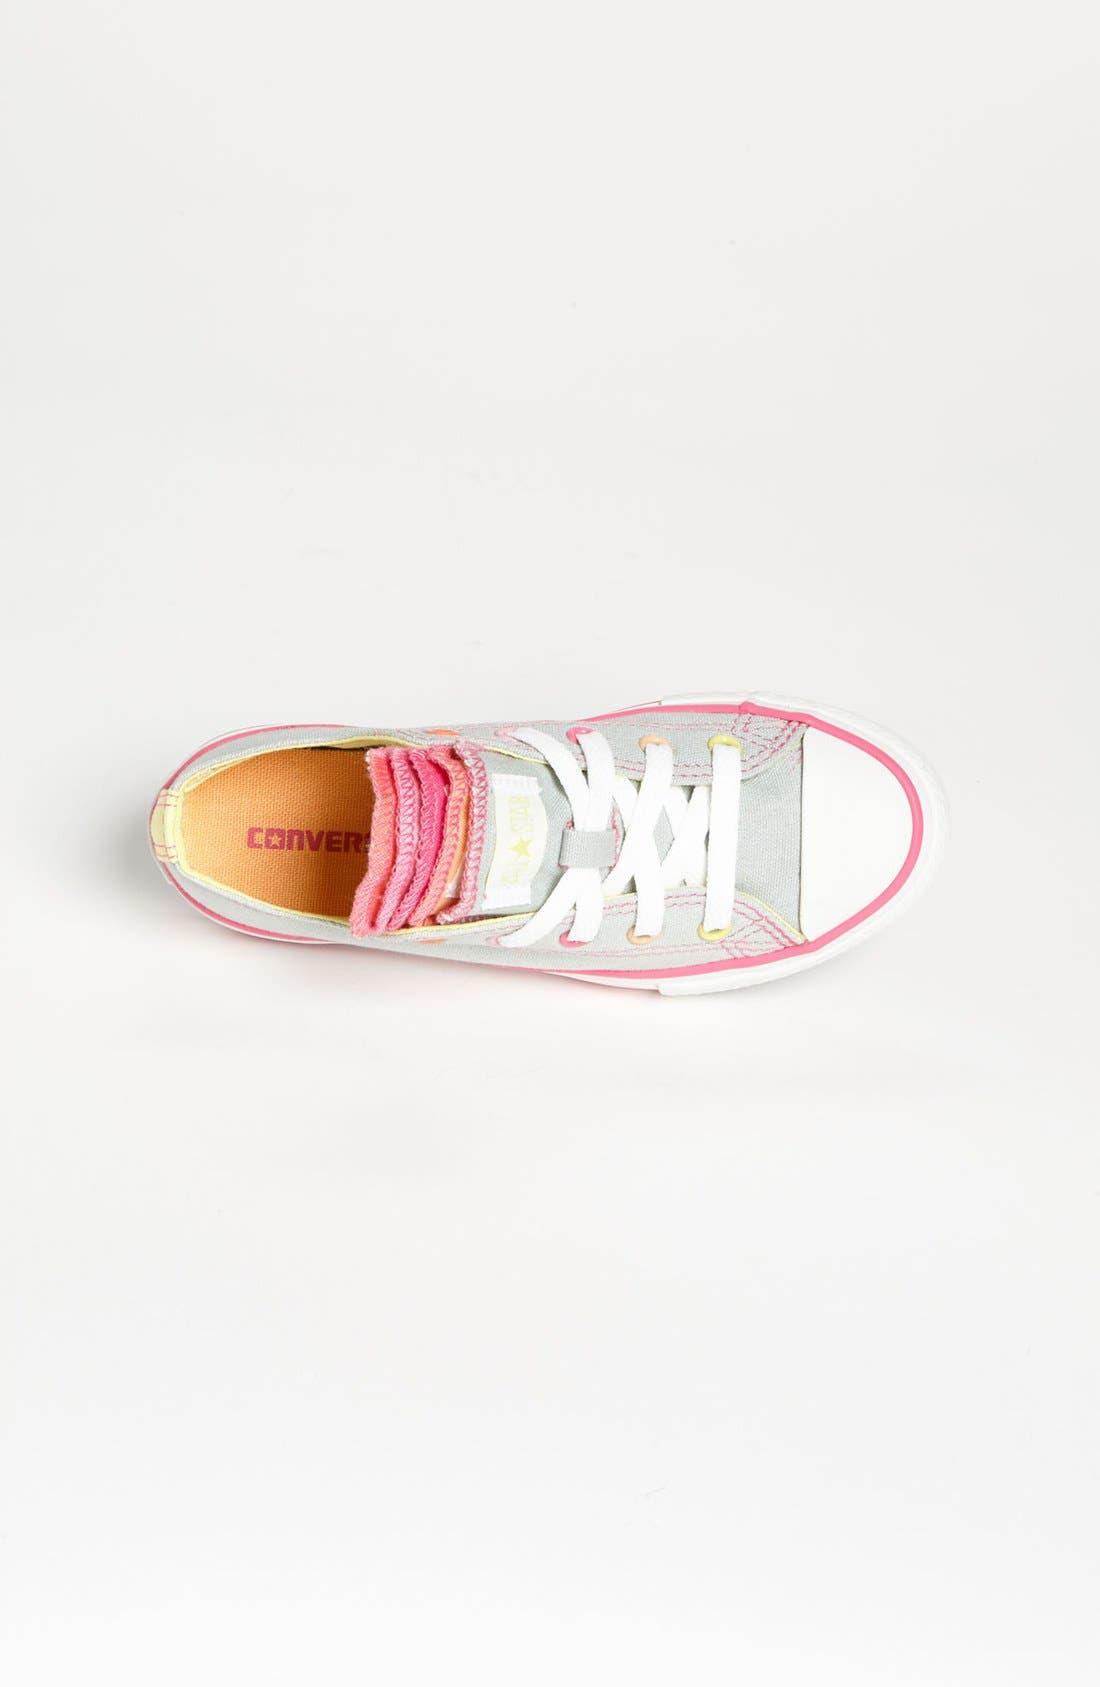 Alternate Image 3  - Converse All Star® Multi-Tongue Sneaker (Toddler, Little Kid & Big Kid)